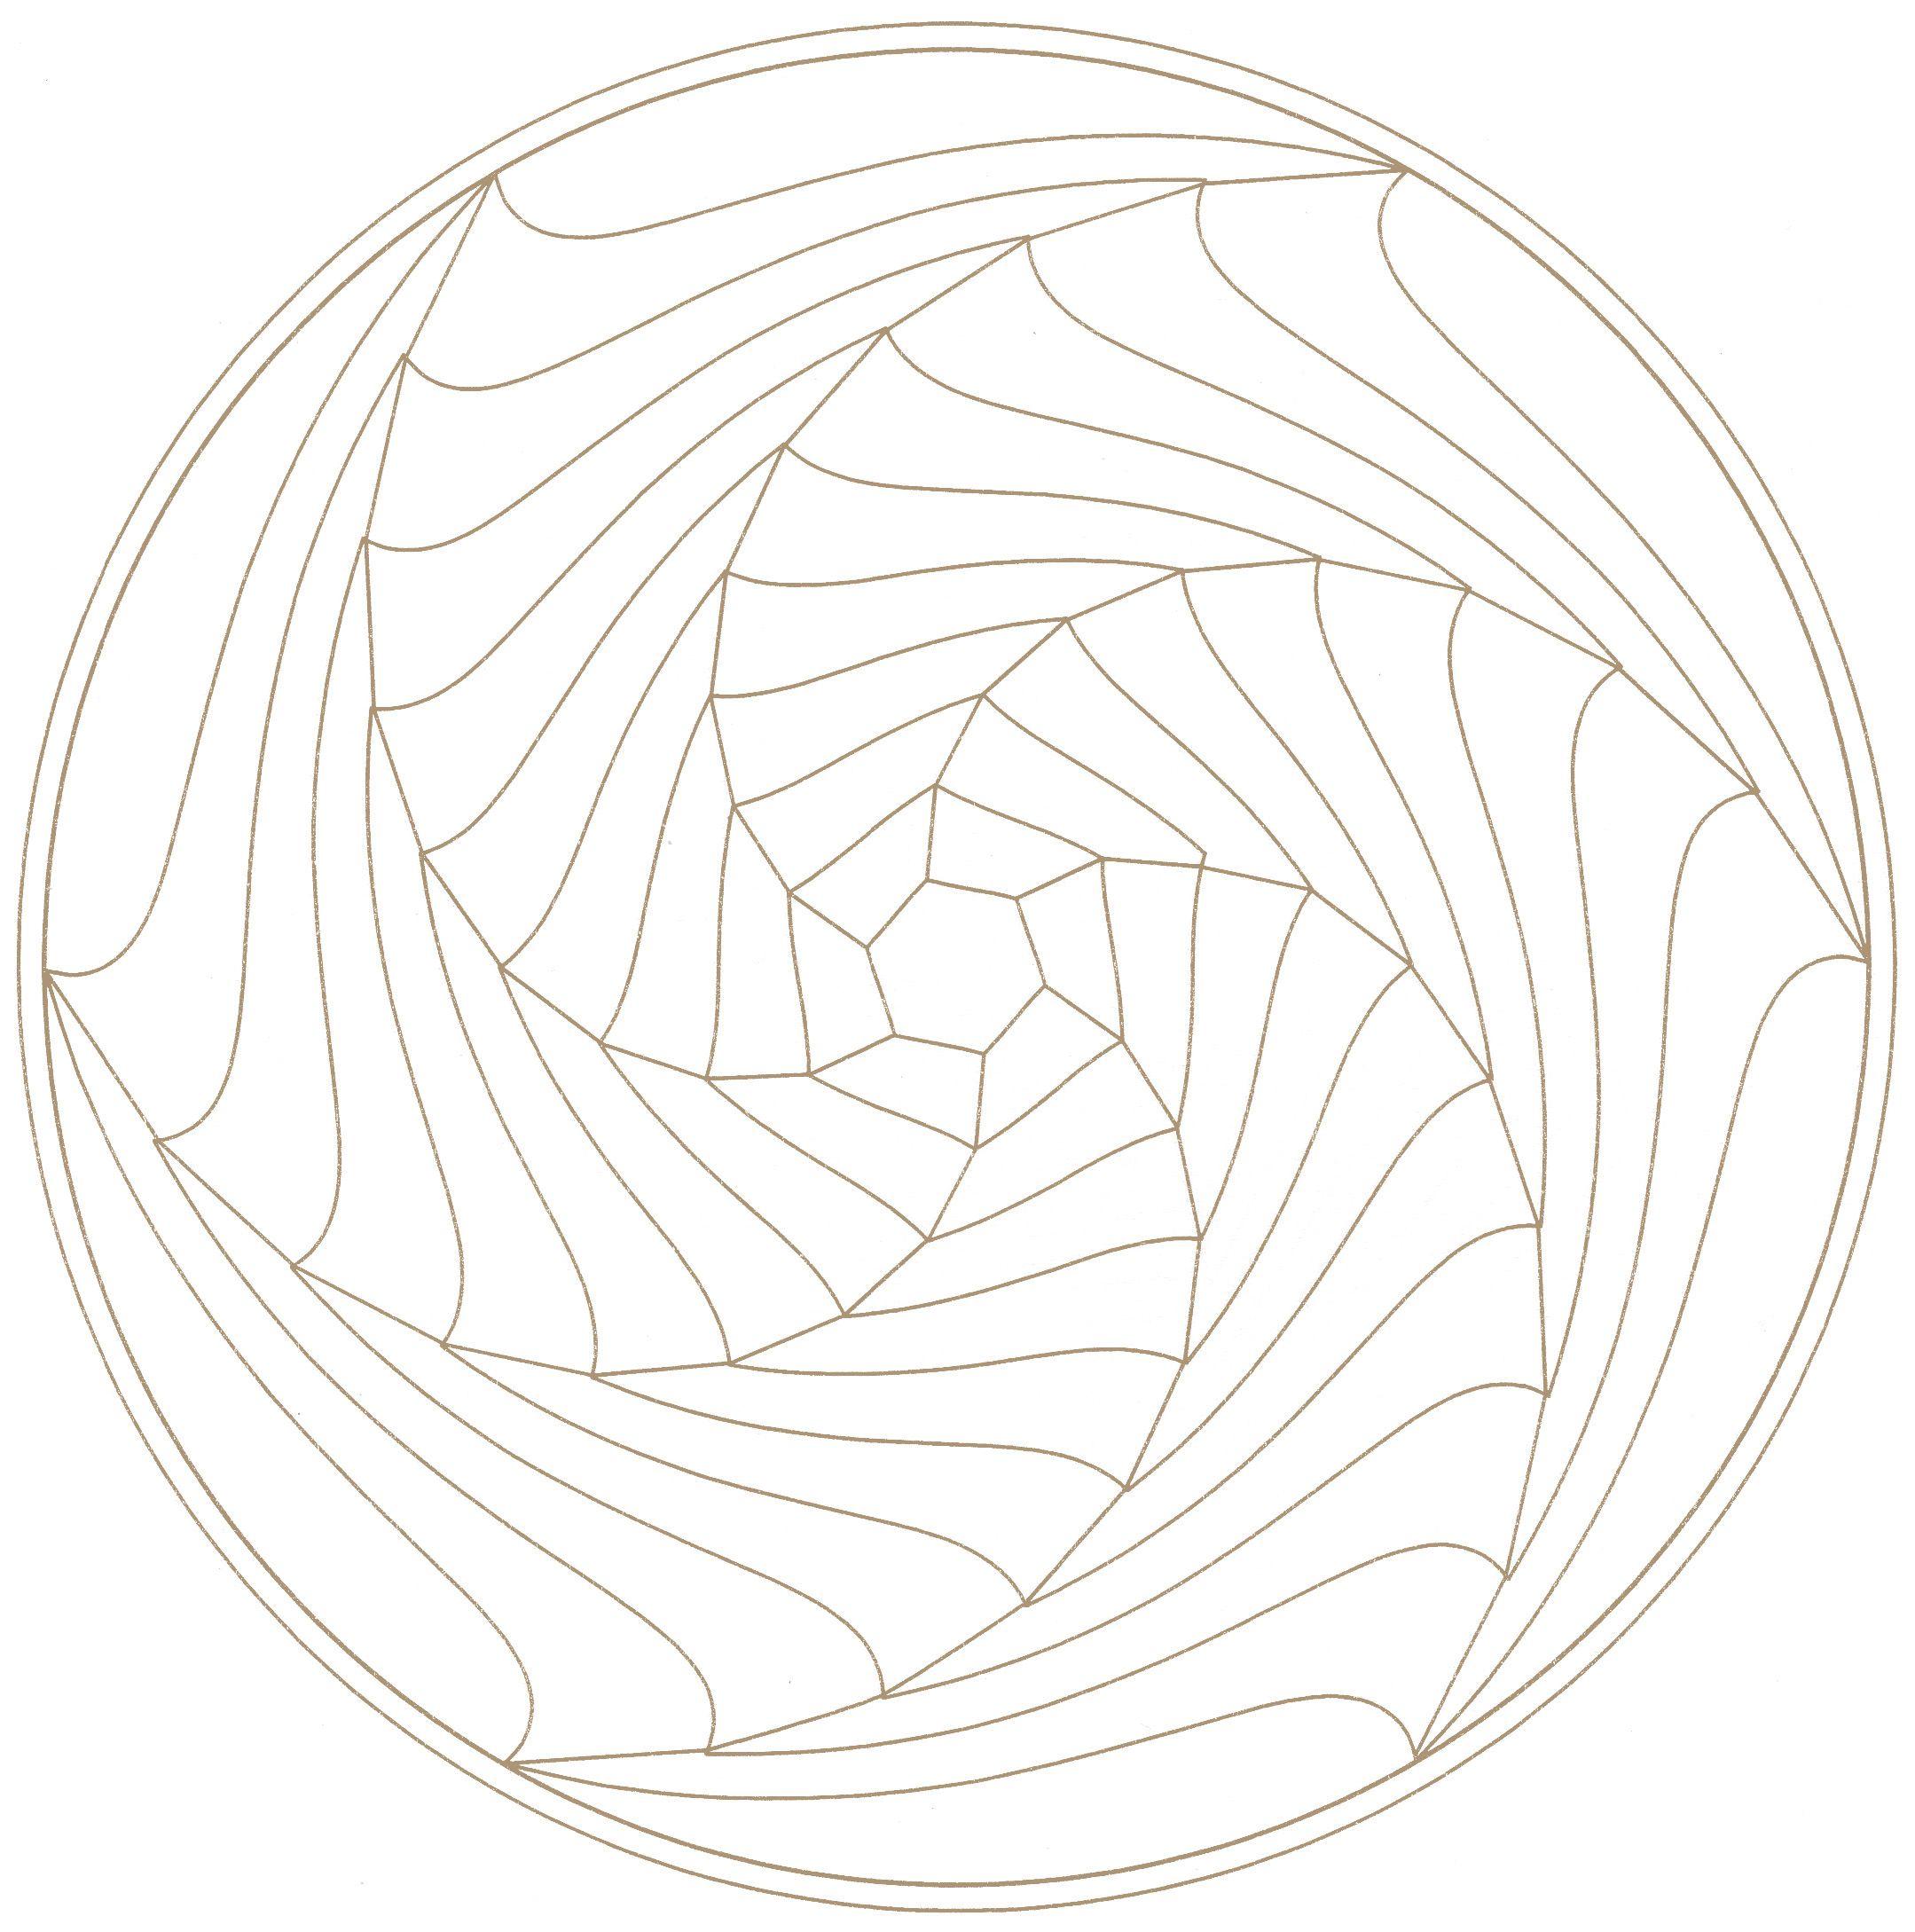 Pin Van Stella Rodriguez Op Mandala Mandala Kleurplaten Dotpainting Patronen